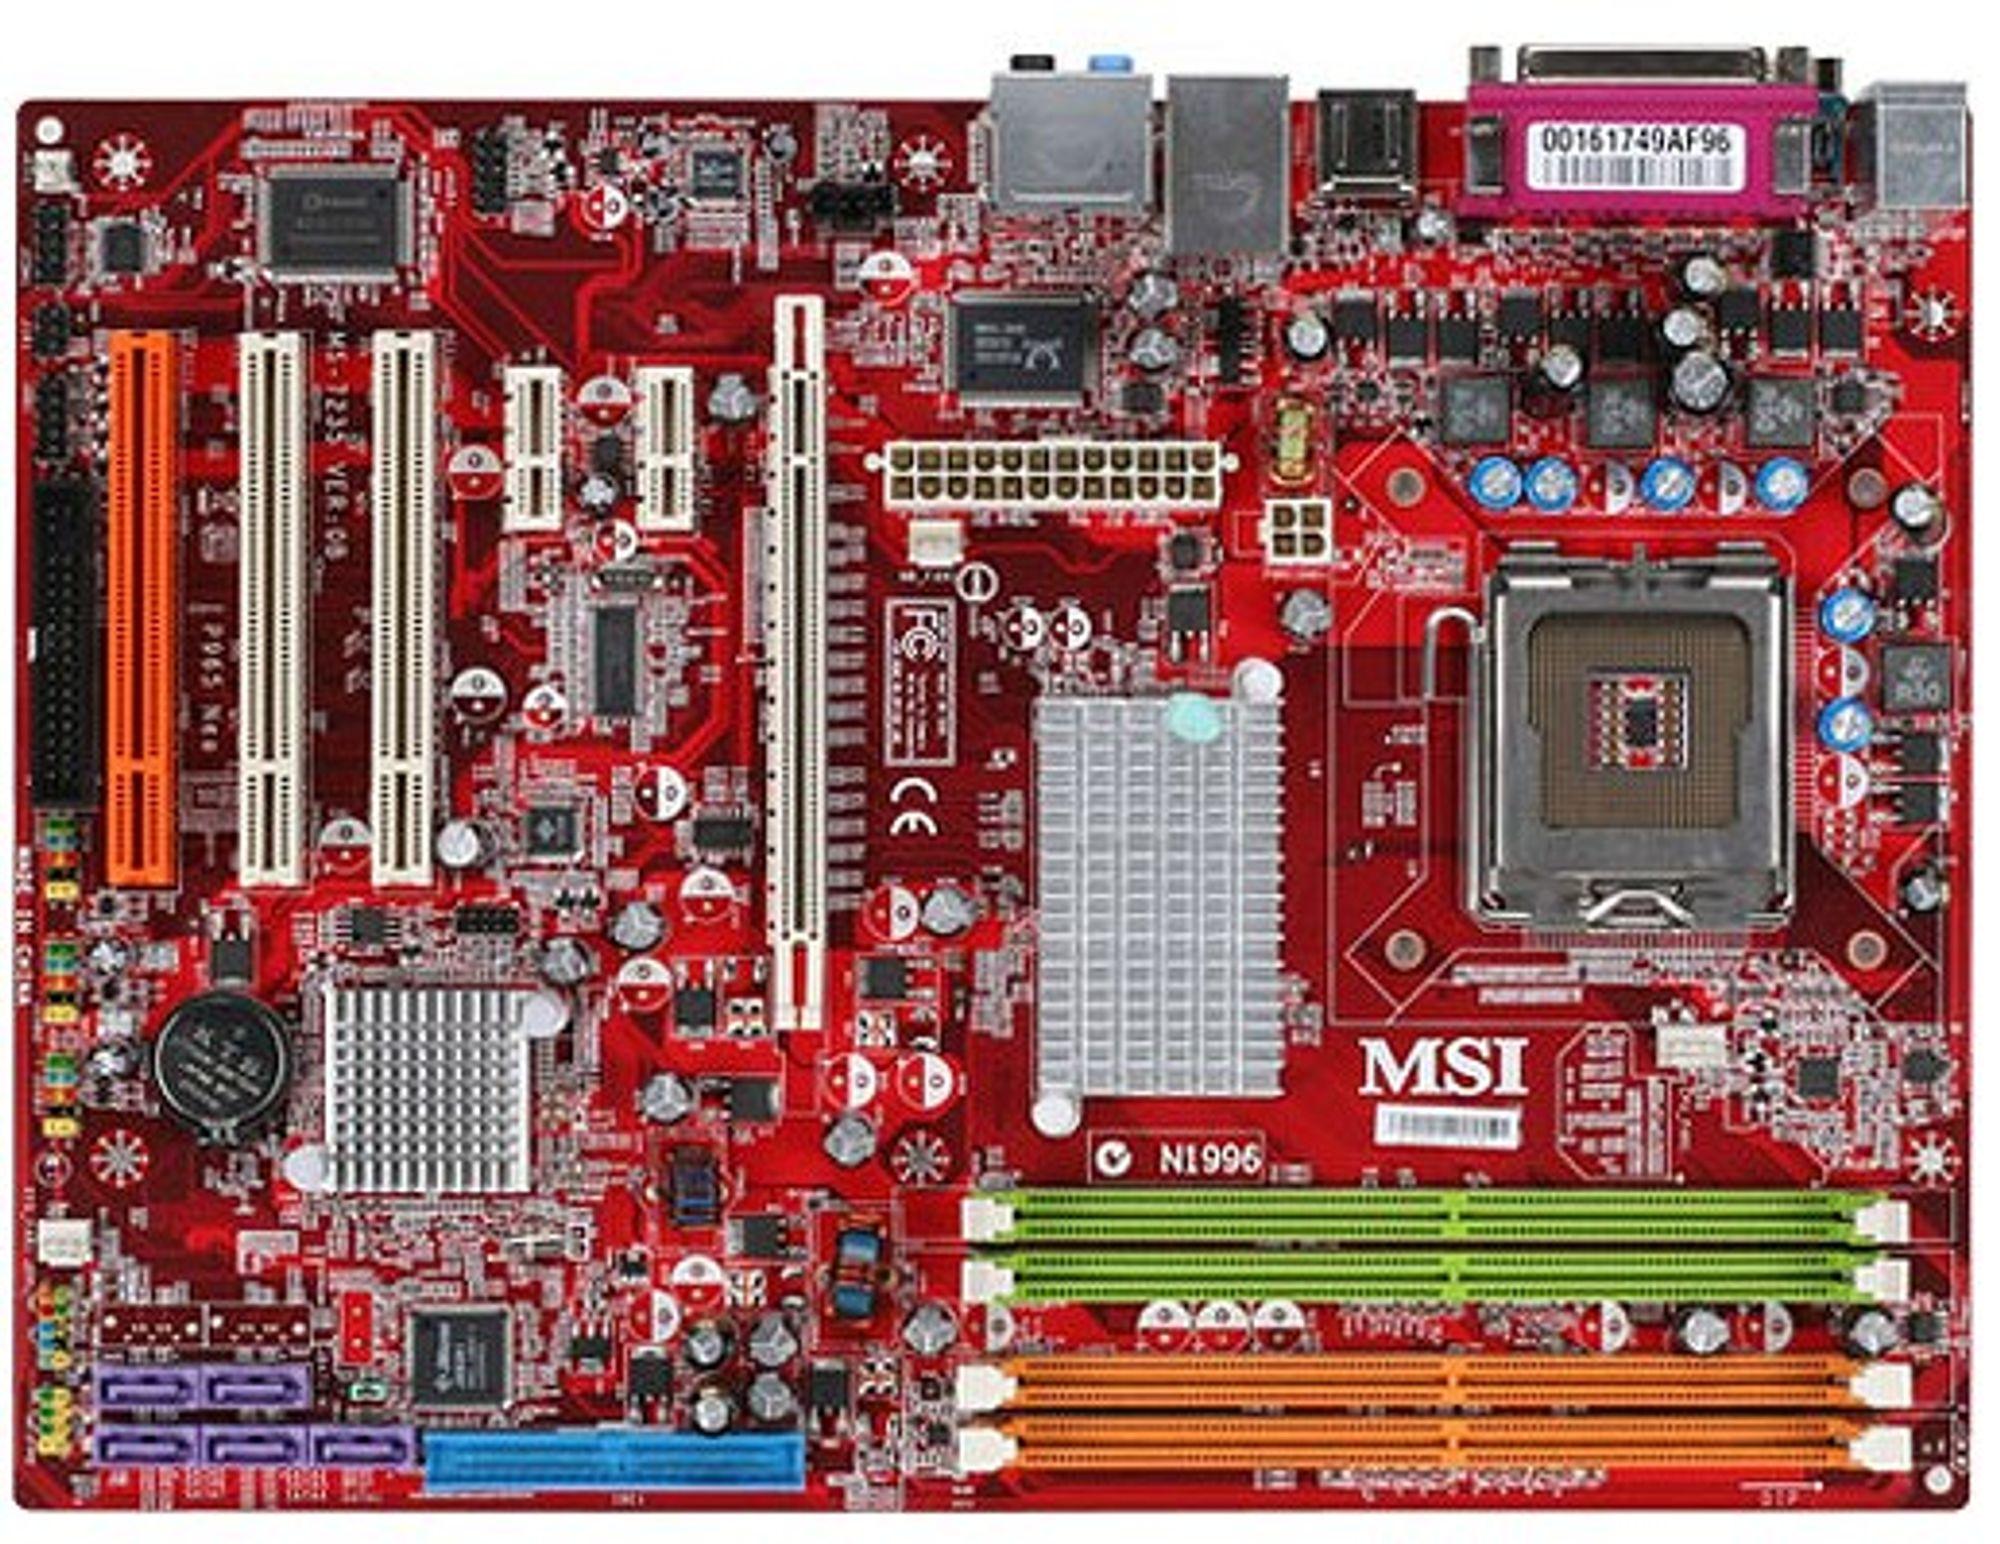 Msi N1996 Motherboard Audio Drivers Download - ncpolaris's diary